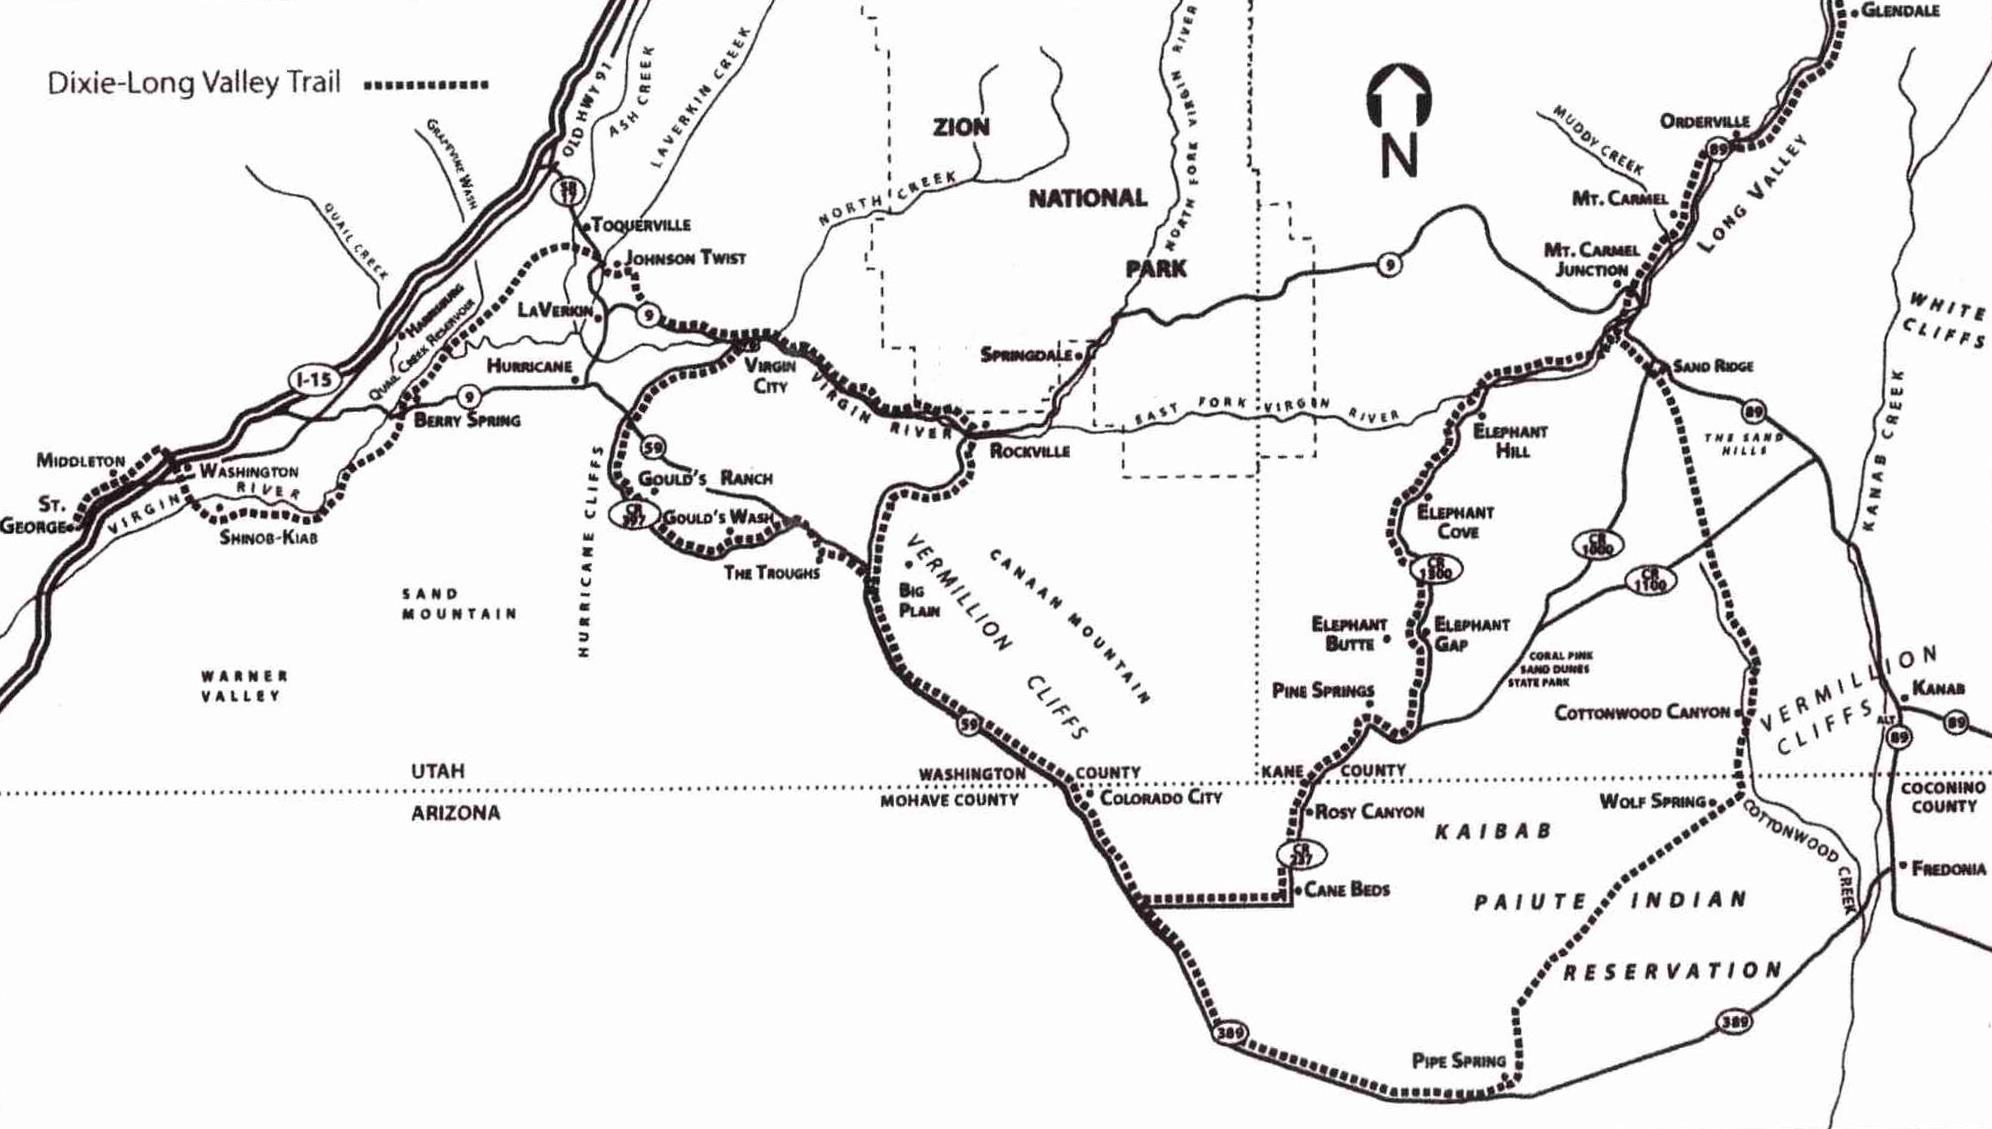 Road Map Of Southern Arizona.Washington County Maps And Charts